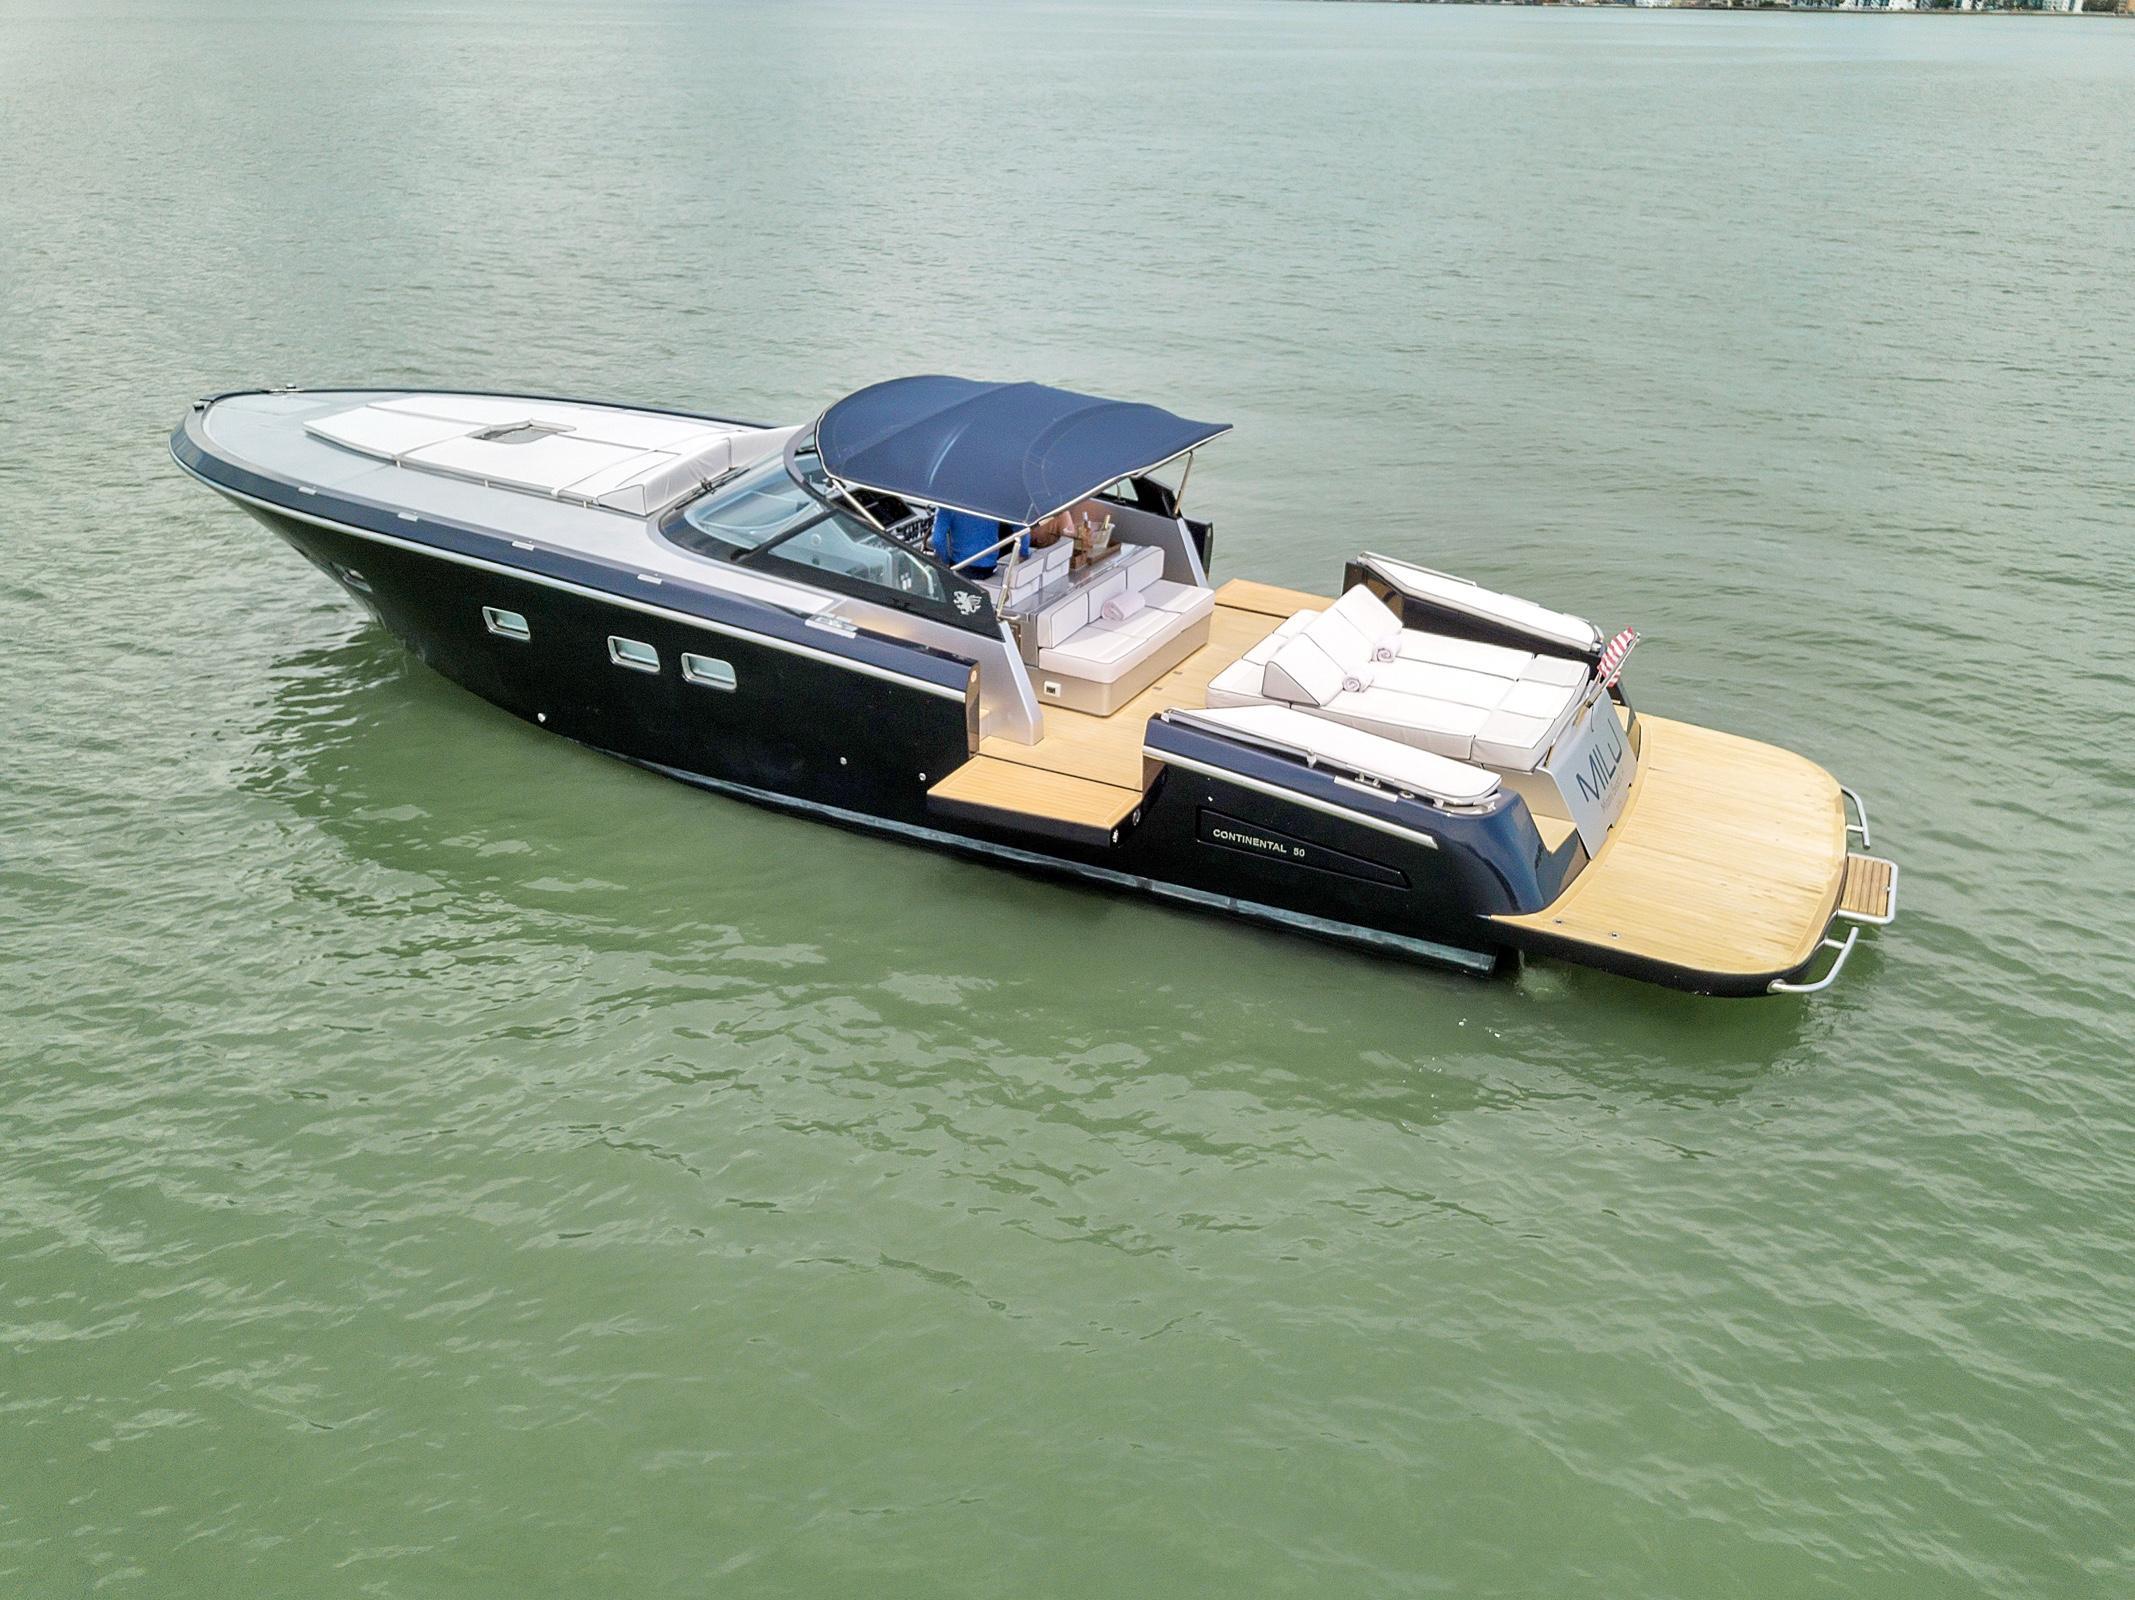 2010 CNM 50' Motor Yacht | HMY Yacht Sales